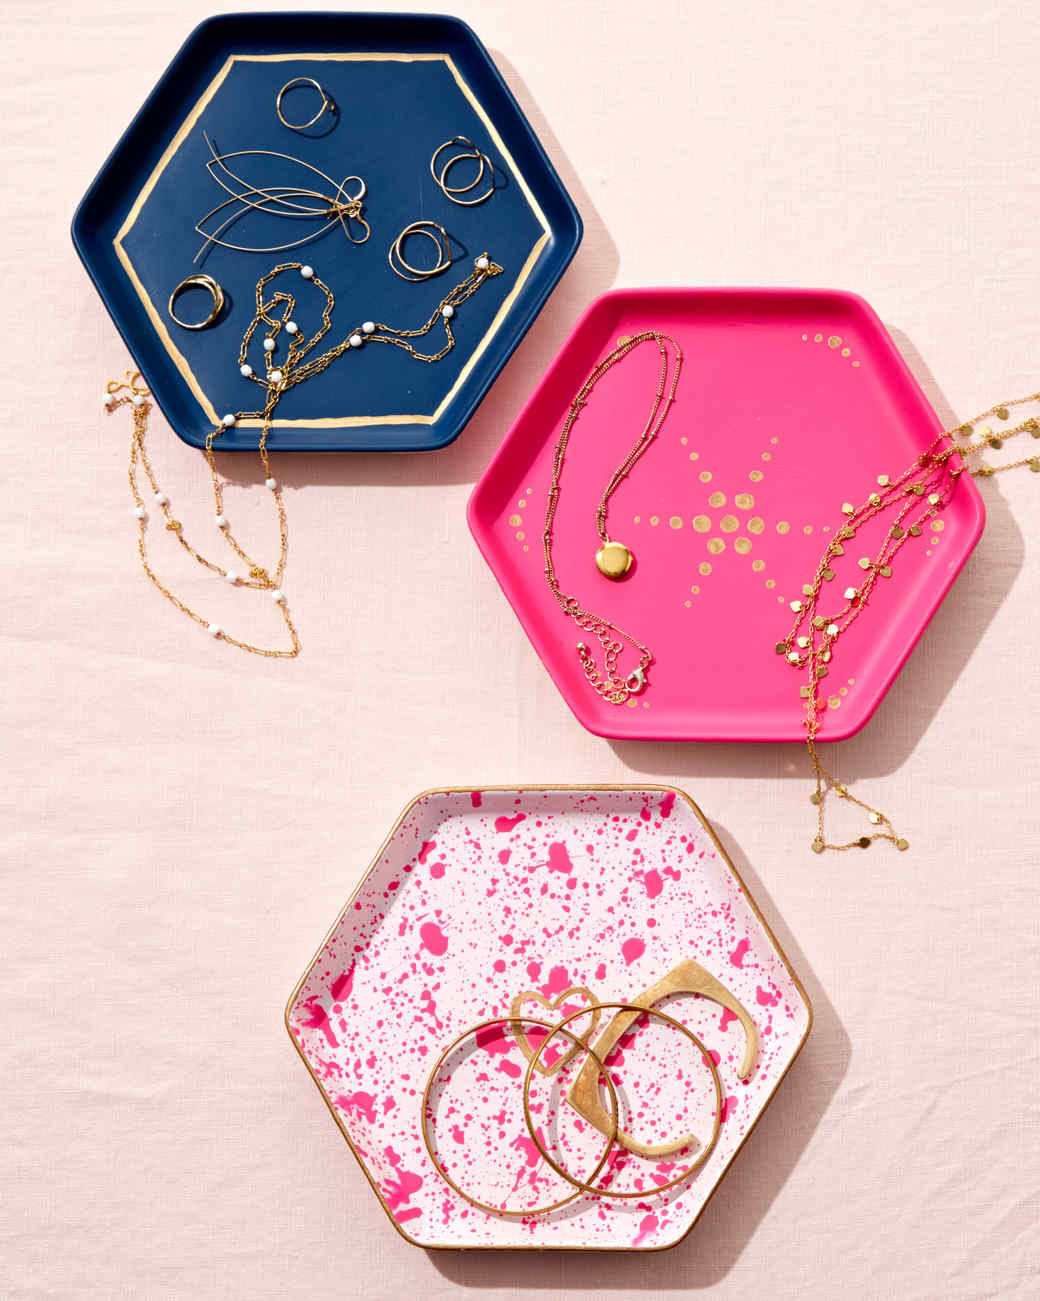 valentines-jewelry-dish-4712.jpg